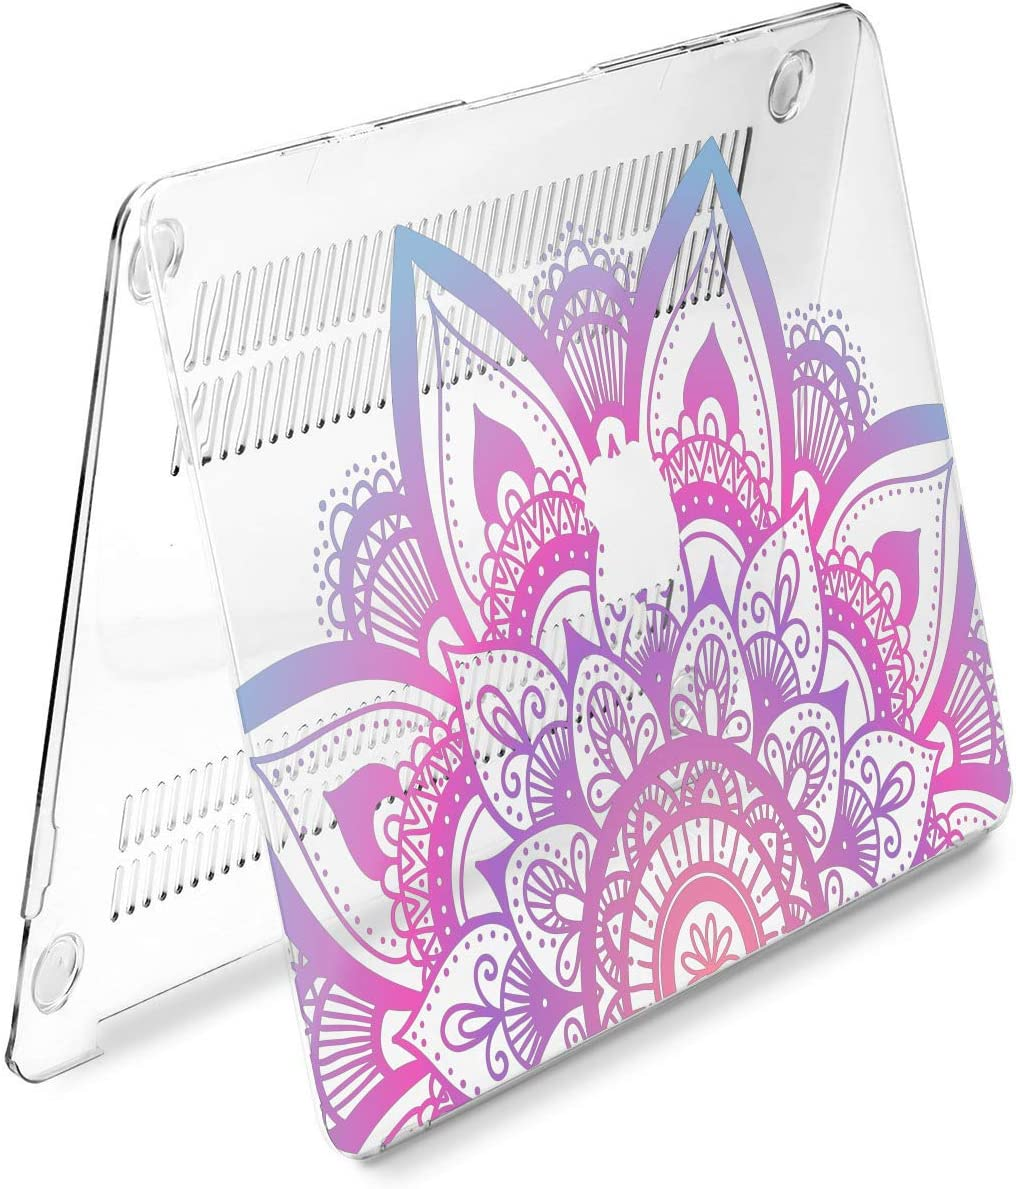 Cavka Hard Shell Case for Apple MacBook Pro 13 2019 15 2018 Air 13 2020 Retina 2015 Mac 11 Mac 12 Plastic Beautiful Mandala Pattern Print Green Boho Design Laptop Pink Cover Oriental Protective